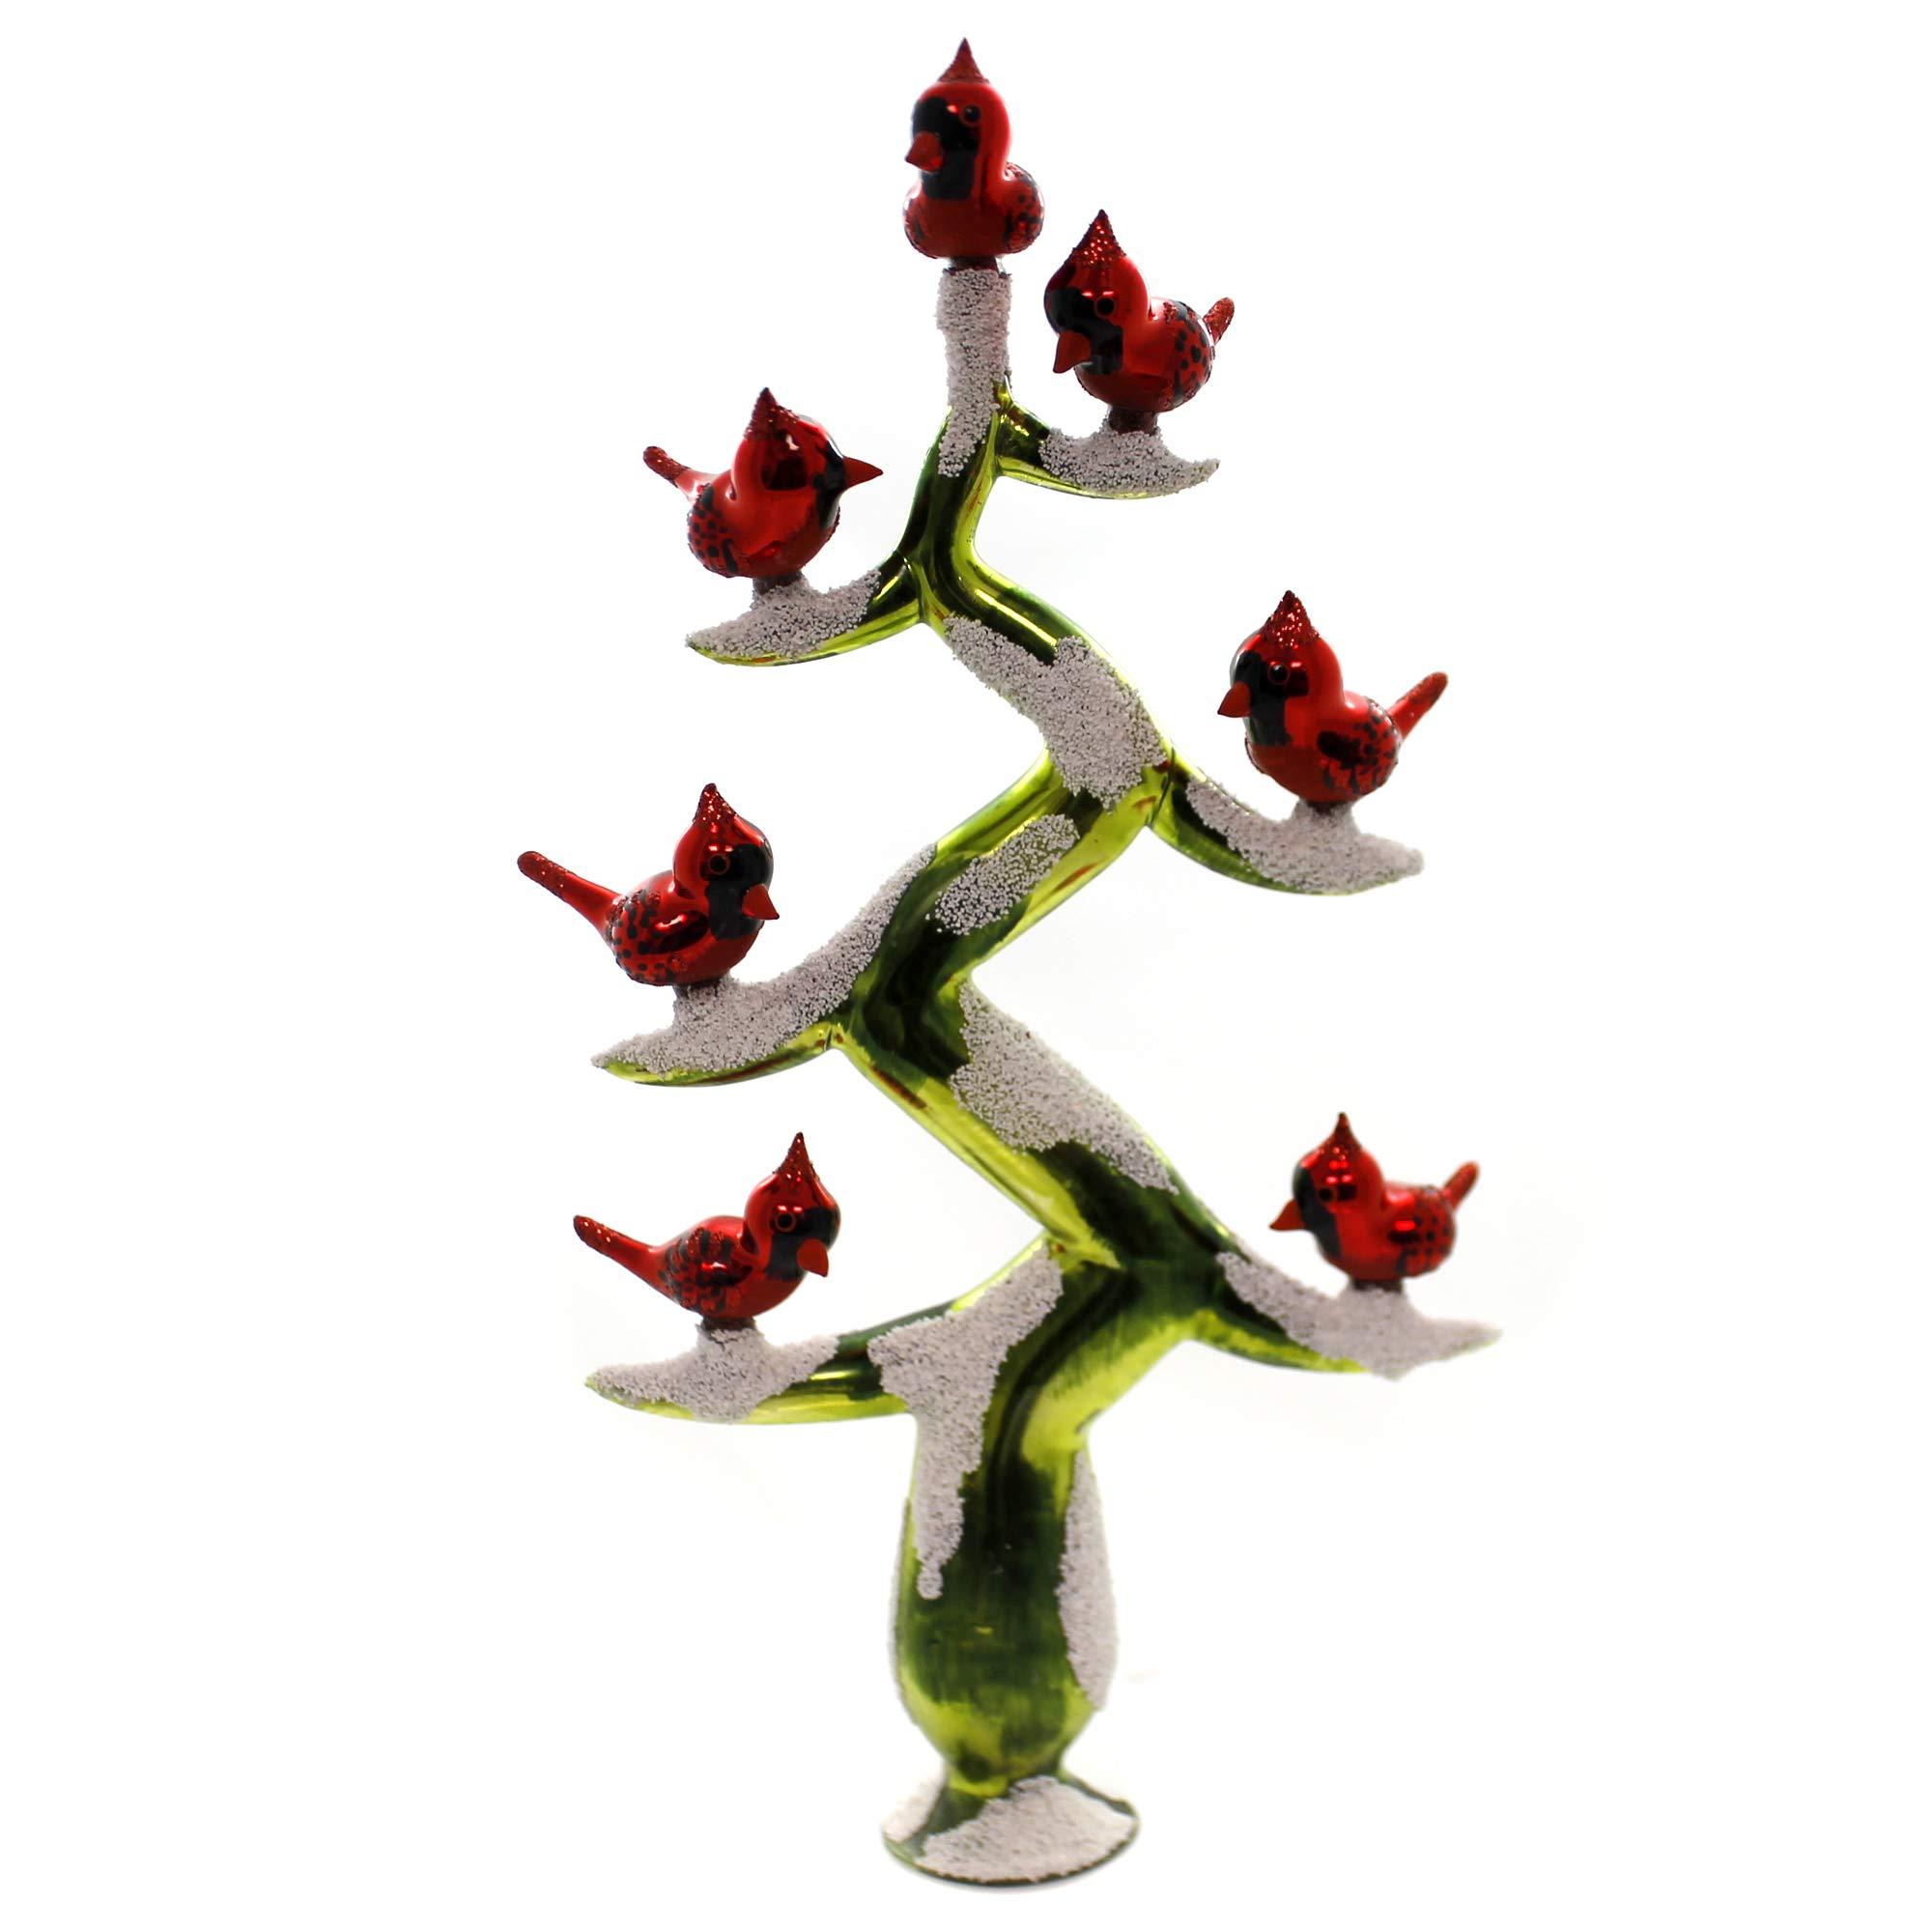 Morawski Cardinals TREETOPPER Glass Tree Branches Poland 17315